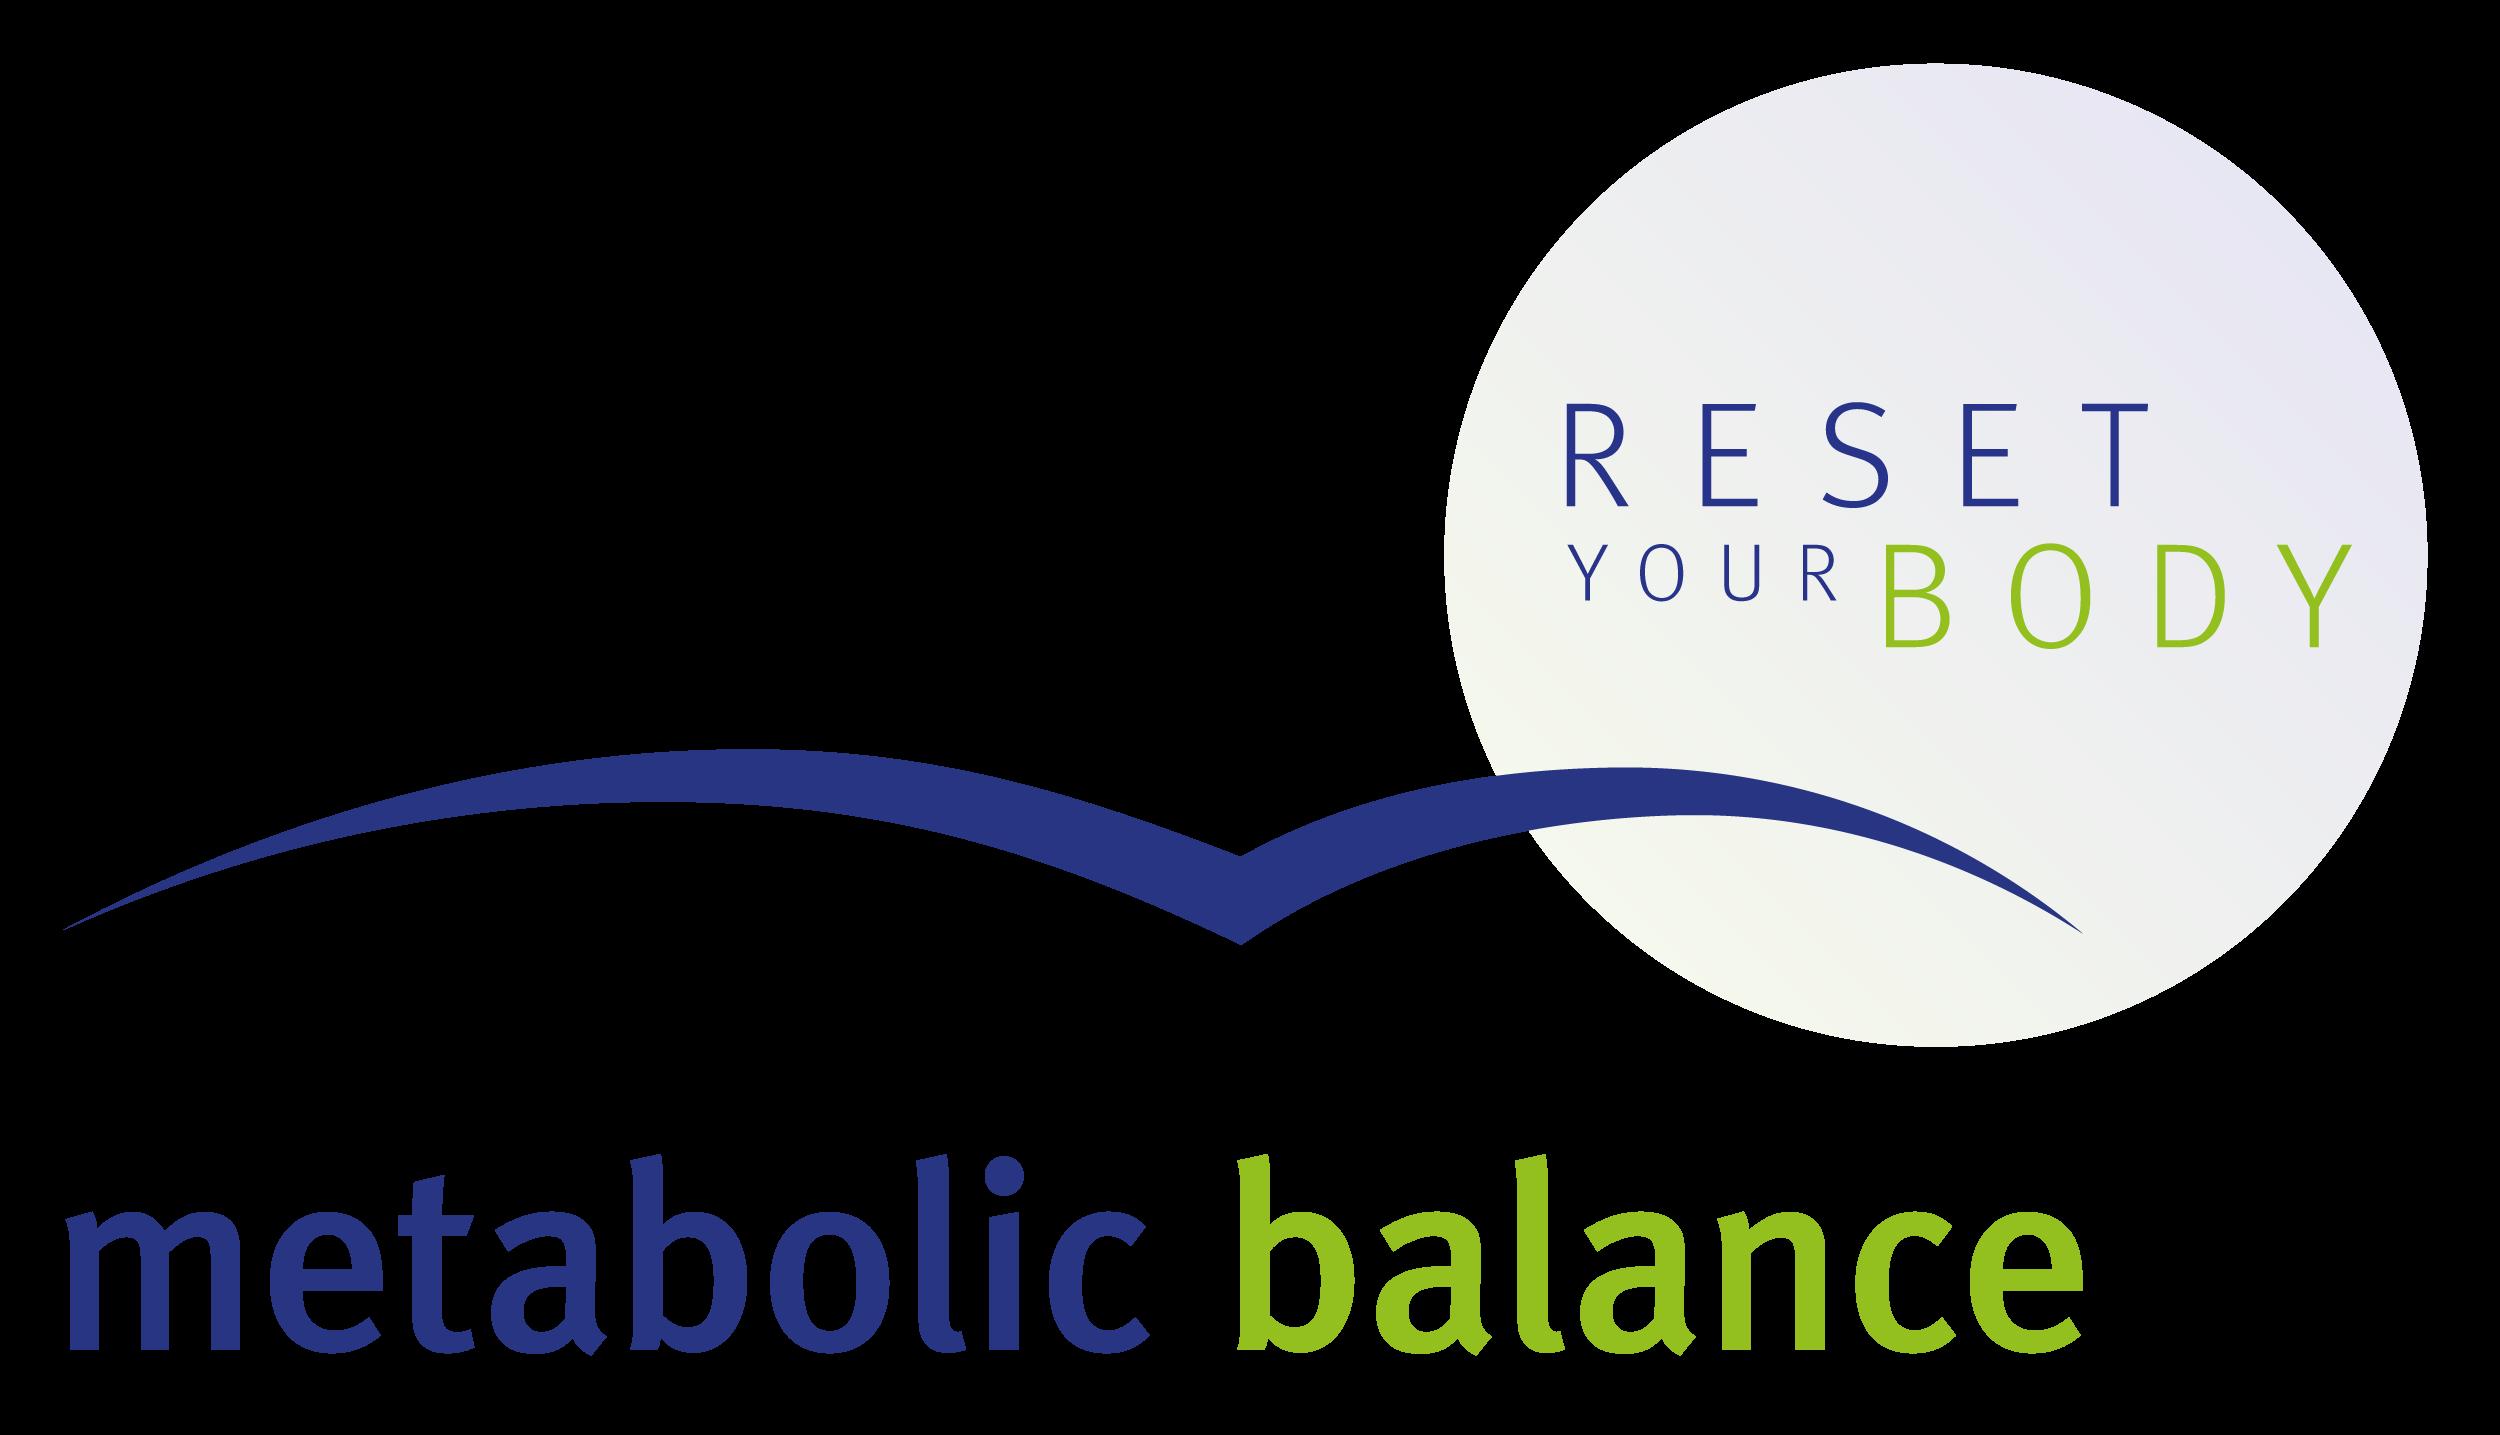 Metabolic Balance reset your body logo